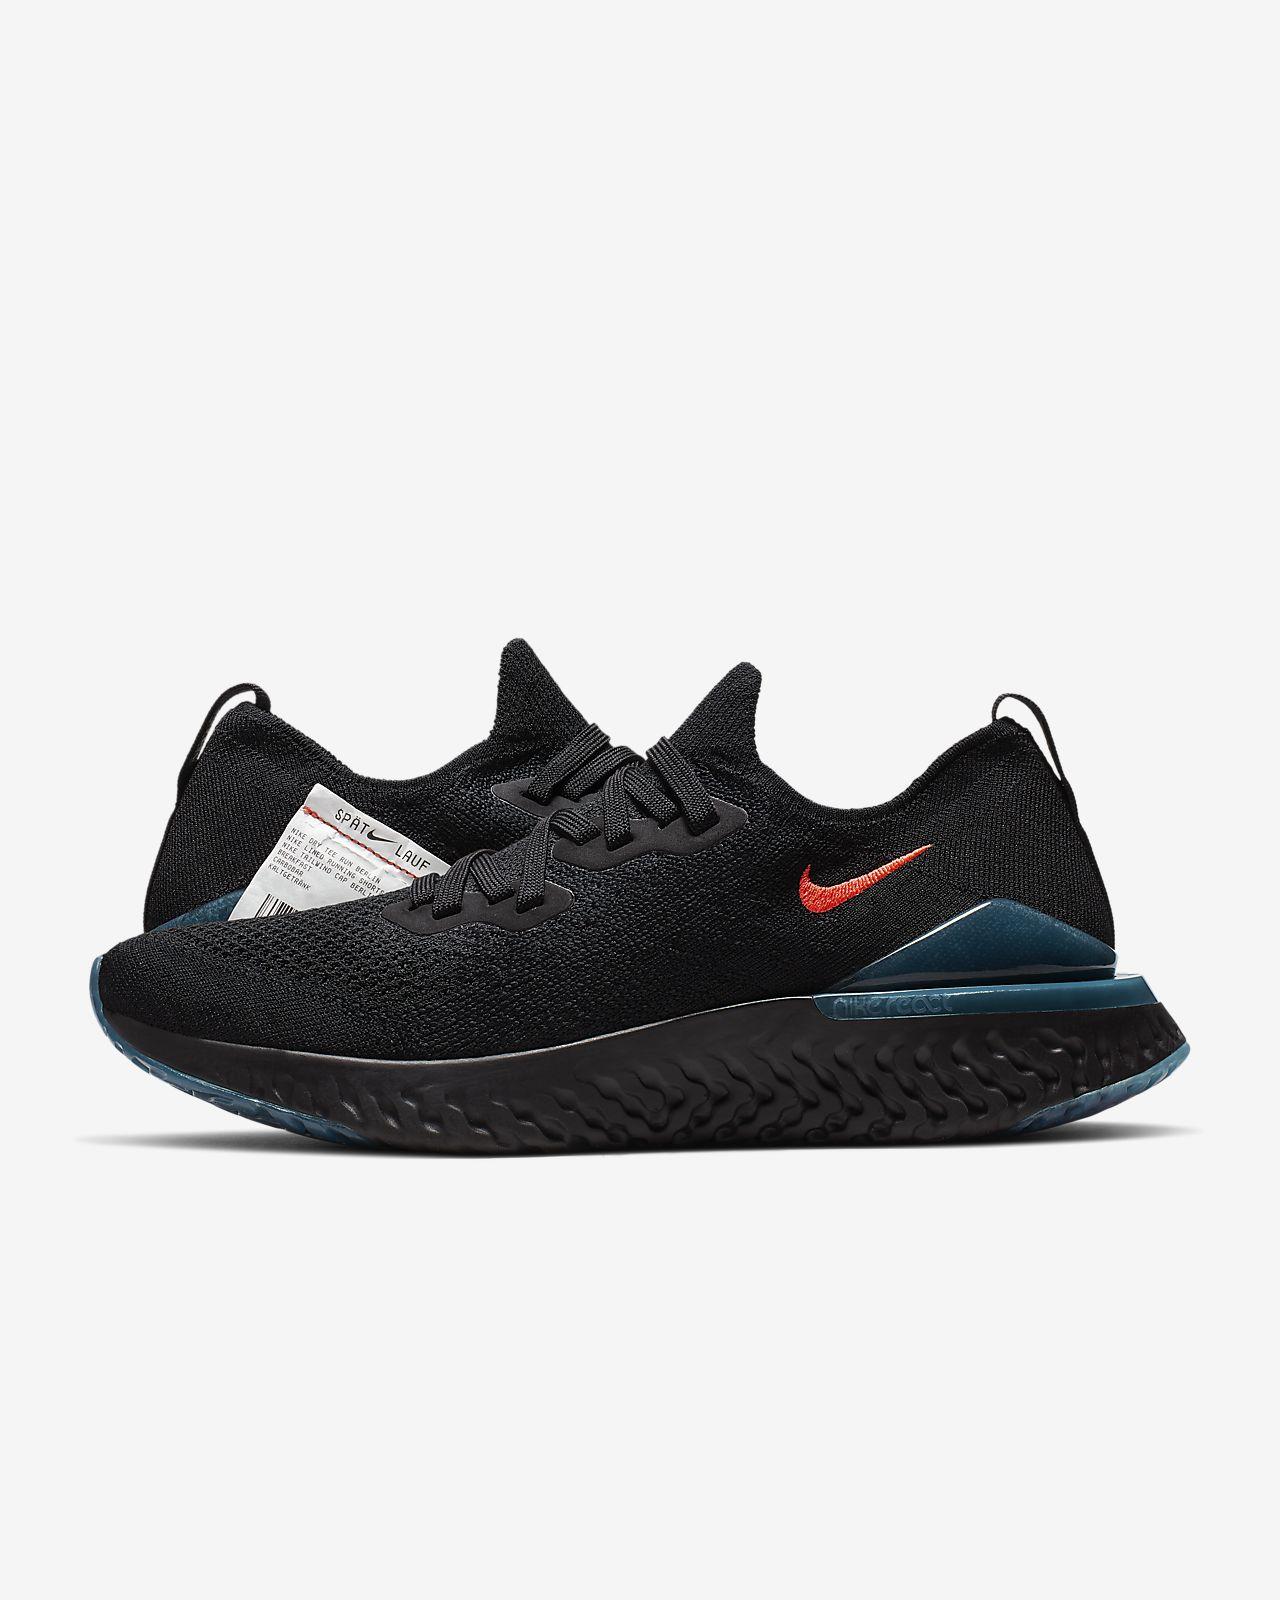 info for 4fd88 c1d79 ... Chaussure de running Nike Epic React FK 2 Späti pour Homme